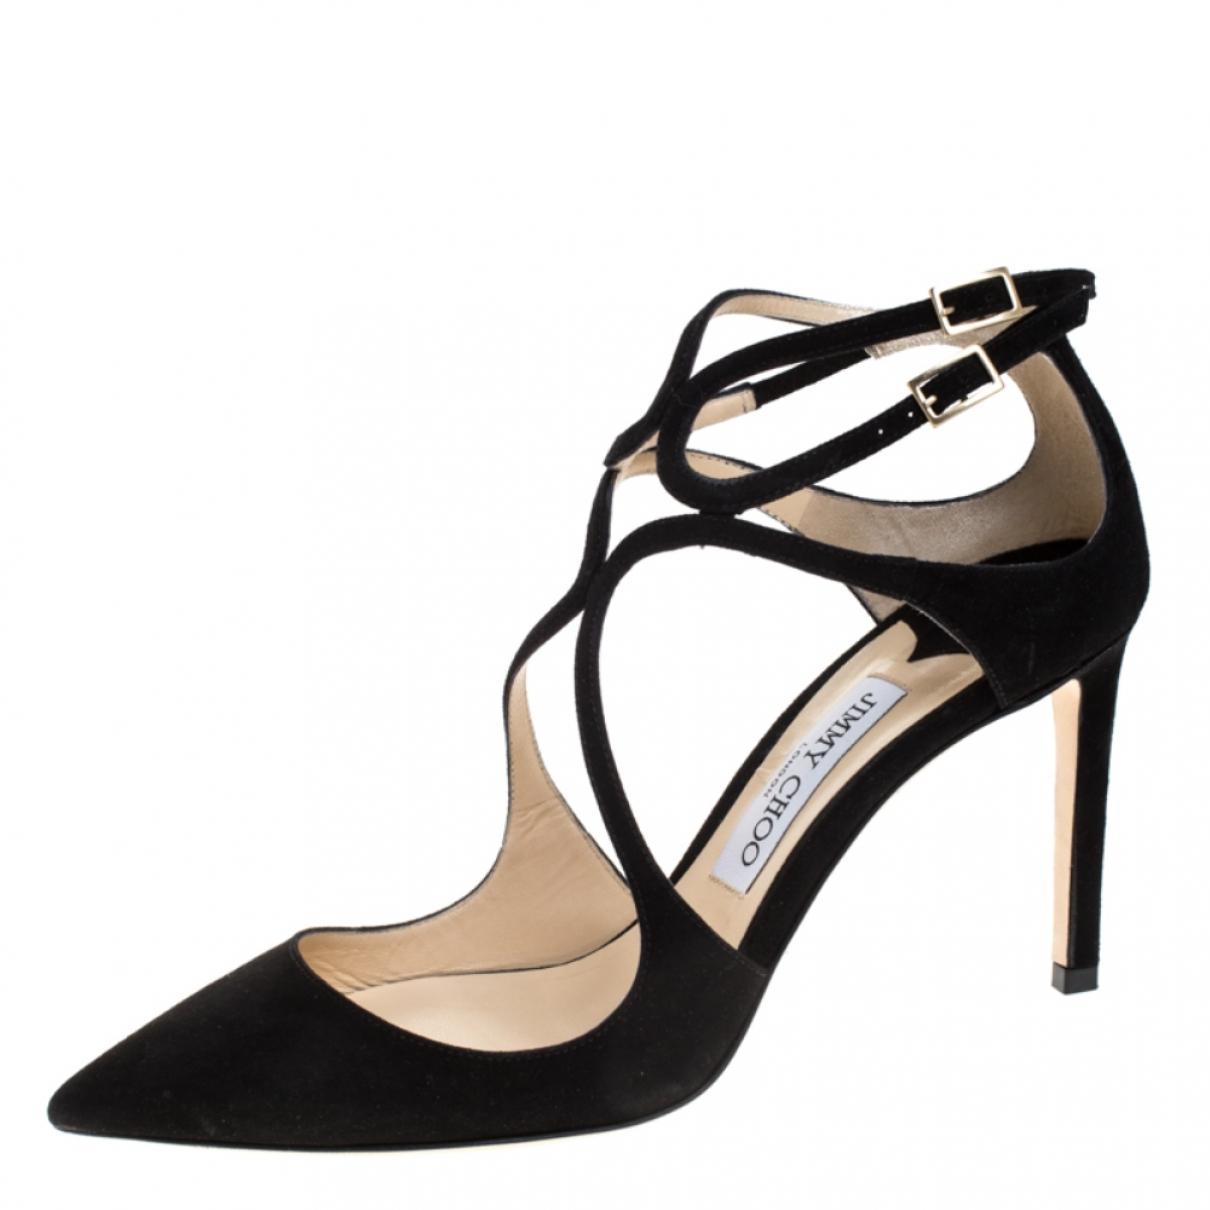 Jimmy Choo \N Black Leather Sandals for Women 8.5 US